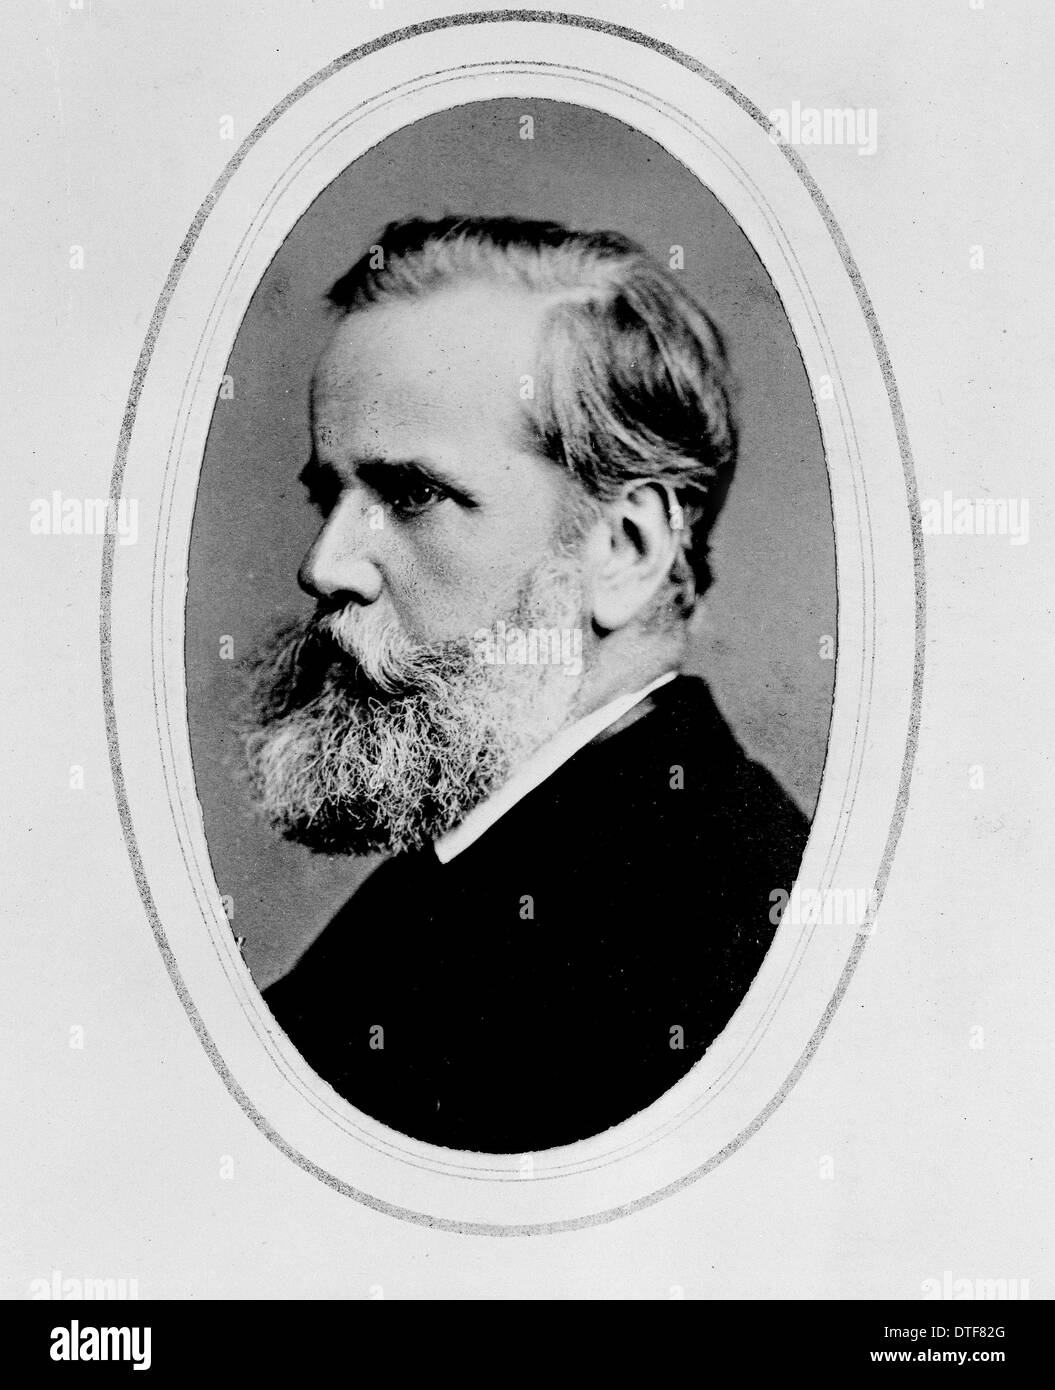 Dom Pedro II, Emperor of Brazil (1825-1891) - Stock Image